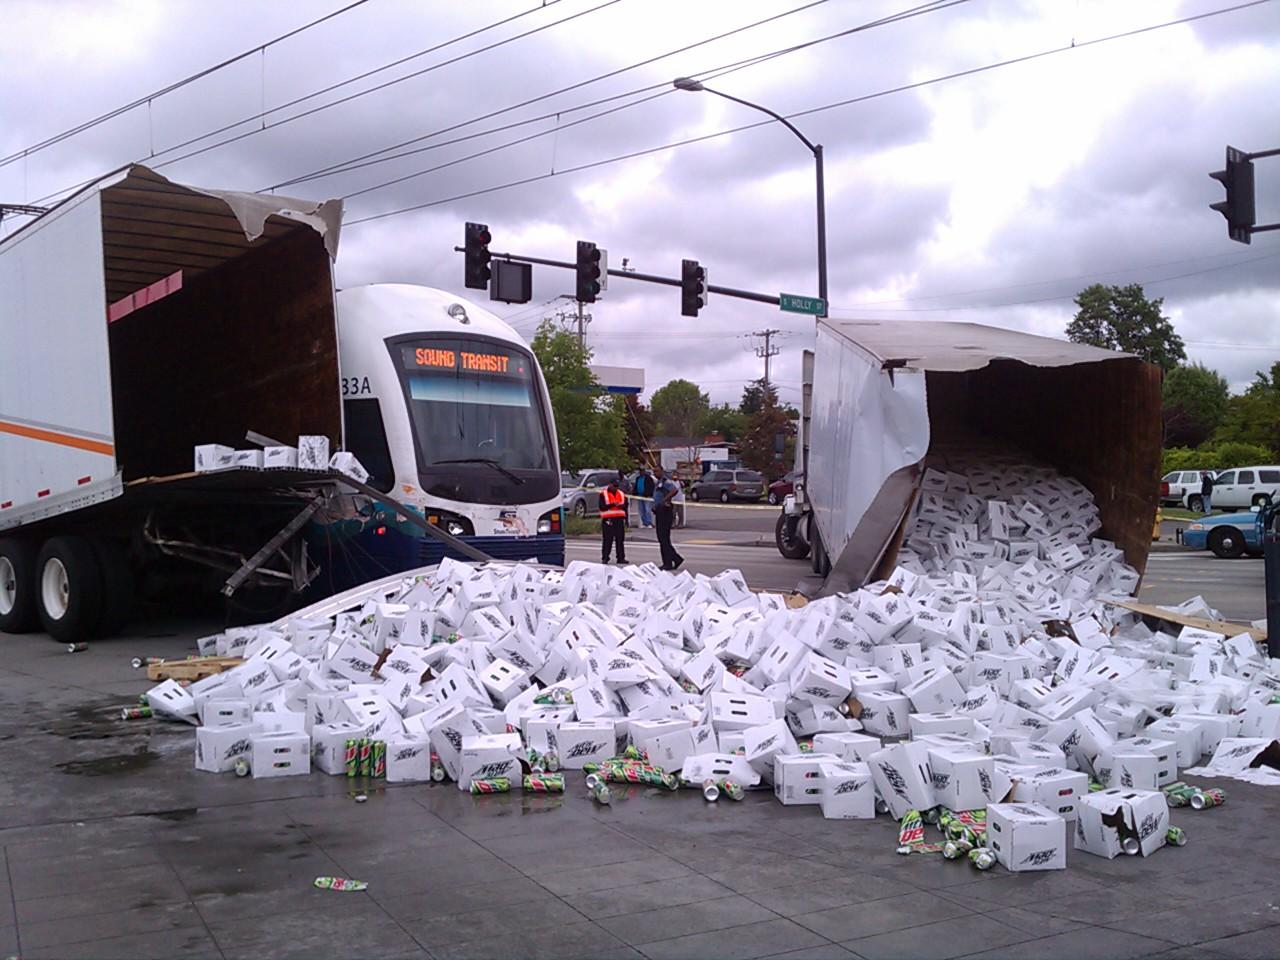 Seattle Light Rail Hazard Analysis Shows High Collision